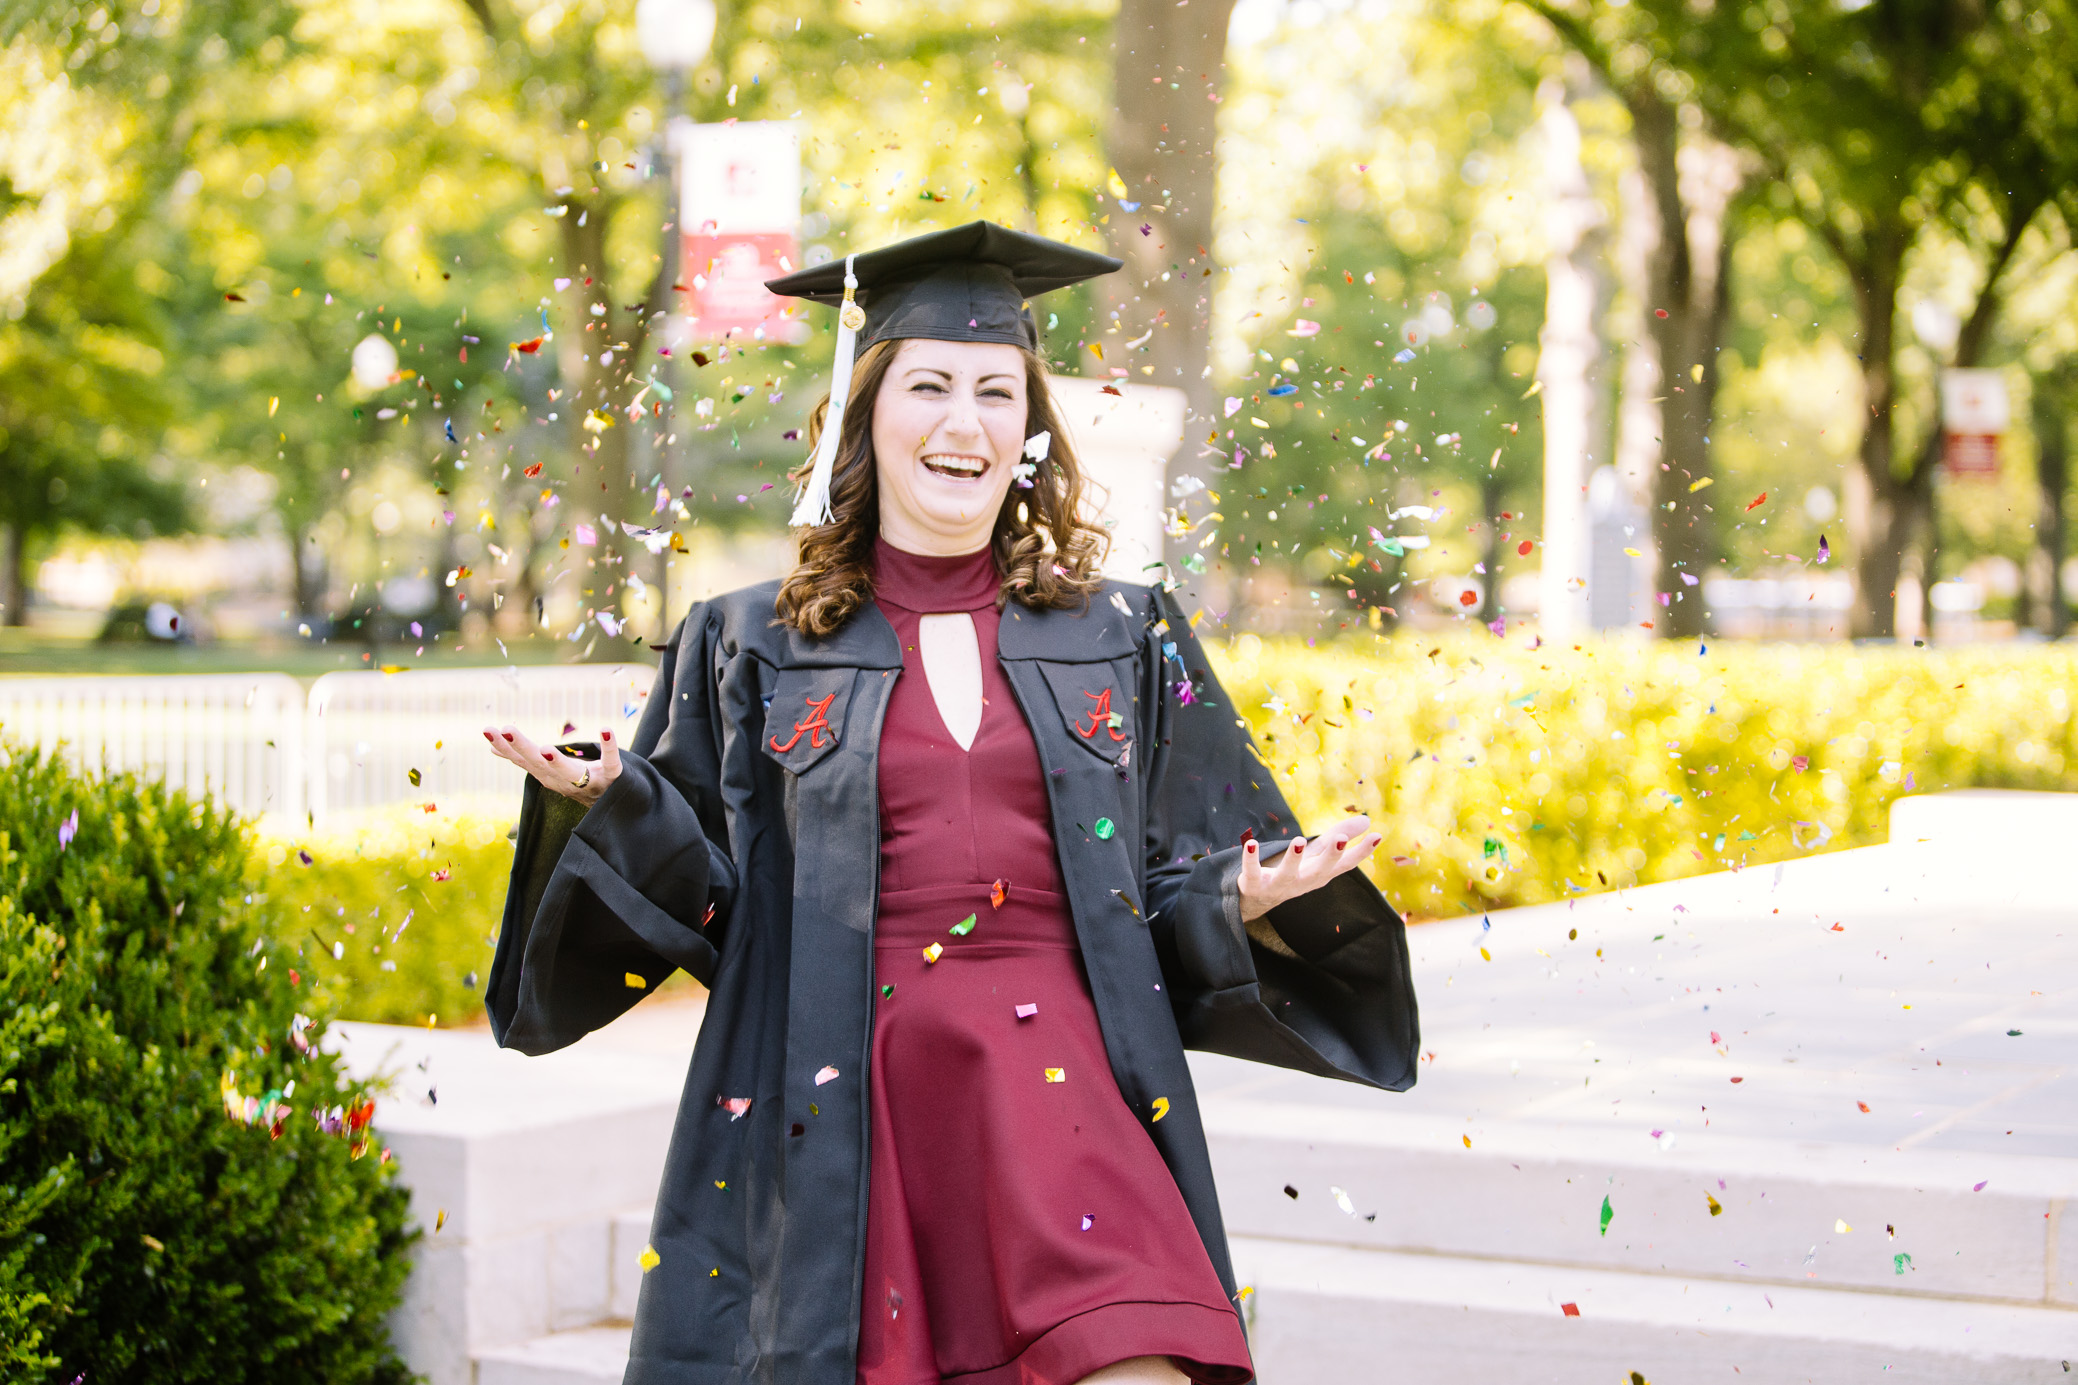 University of Alabama graduation portrait photography in Tuscaloosa, Alabama by David A. Smith of DSmithImages Wedding Photography, Portraits, and Events in Birmingham, Alabama